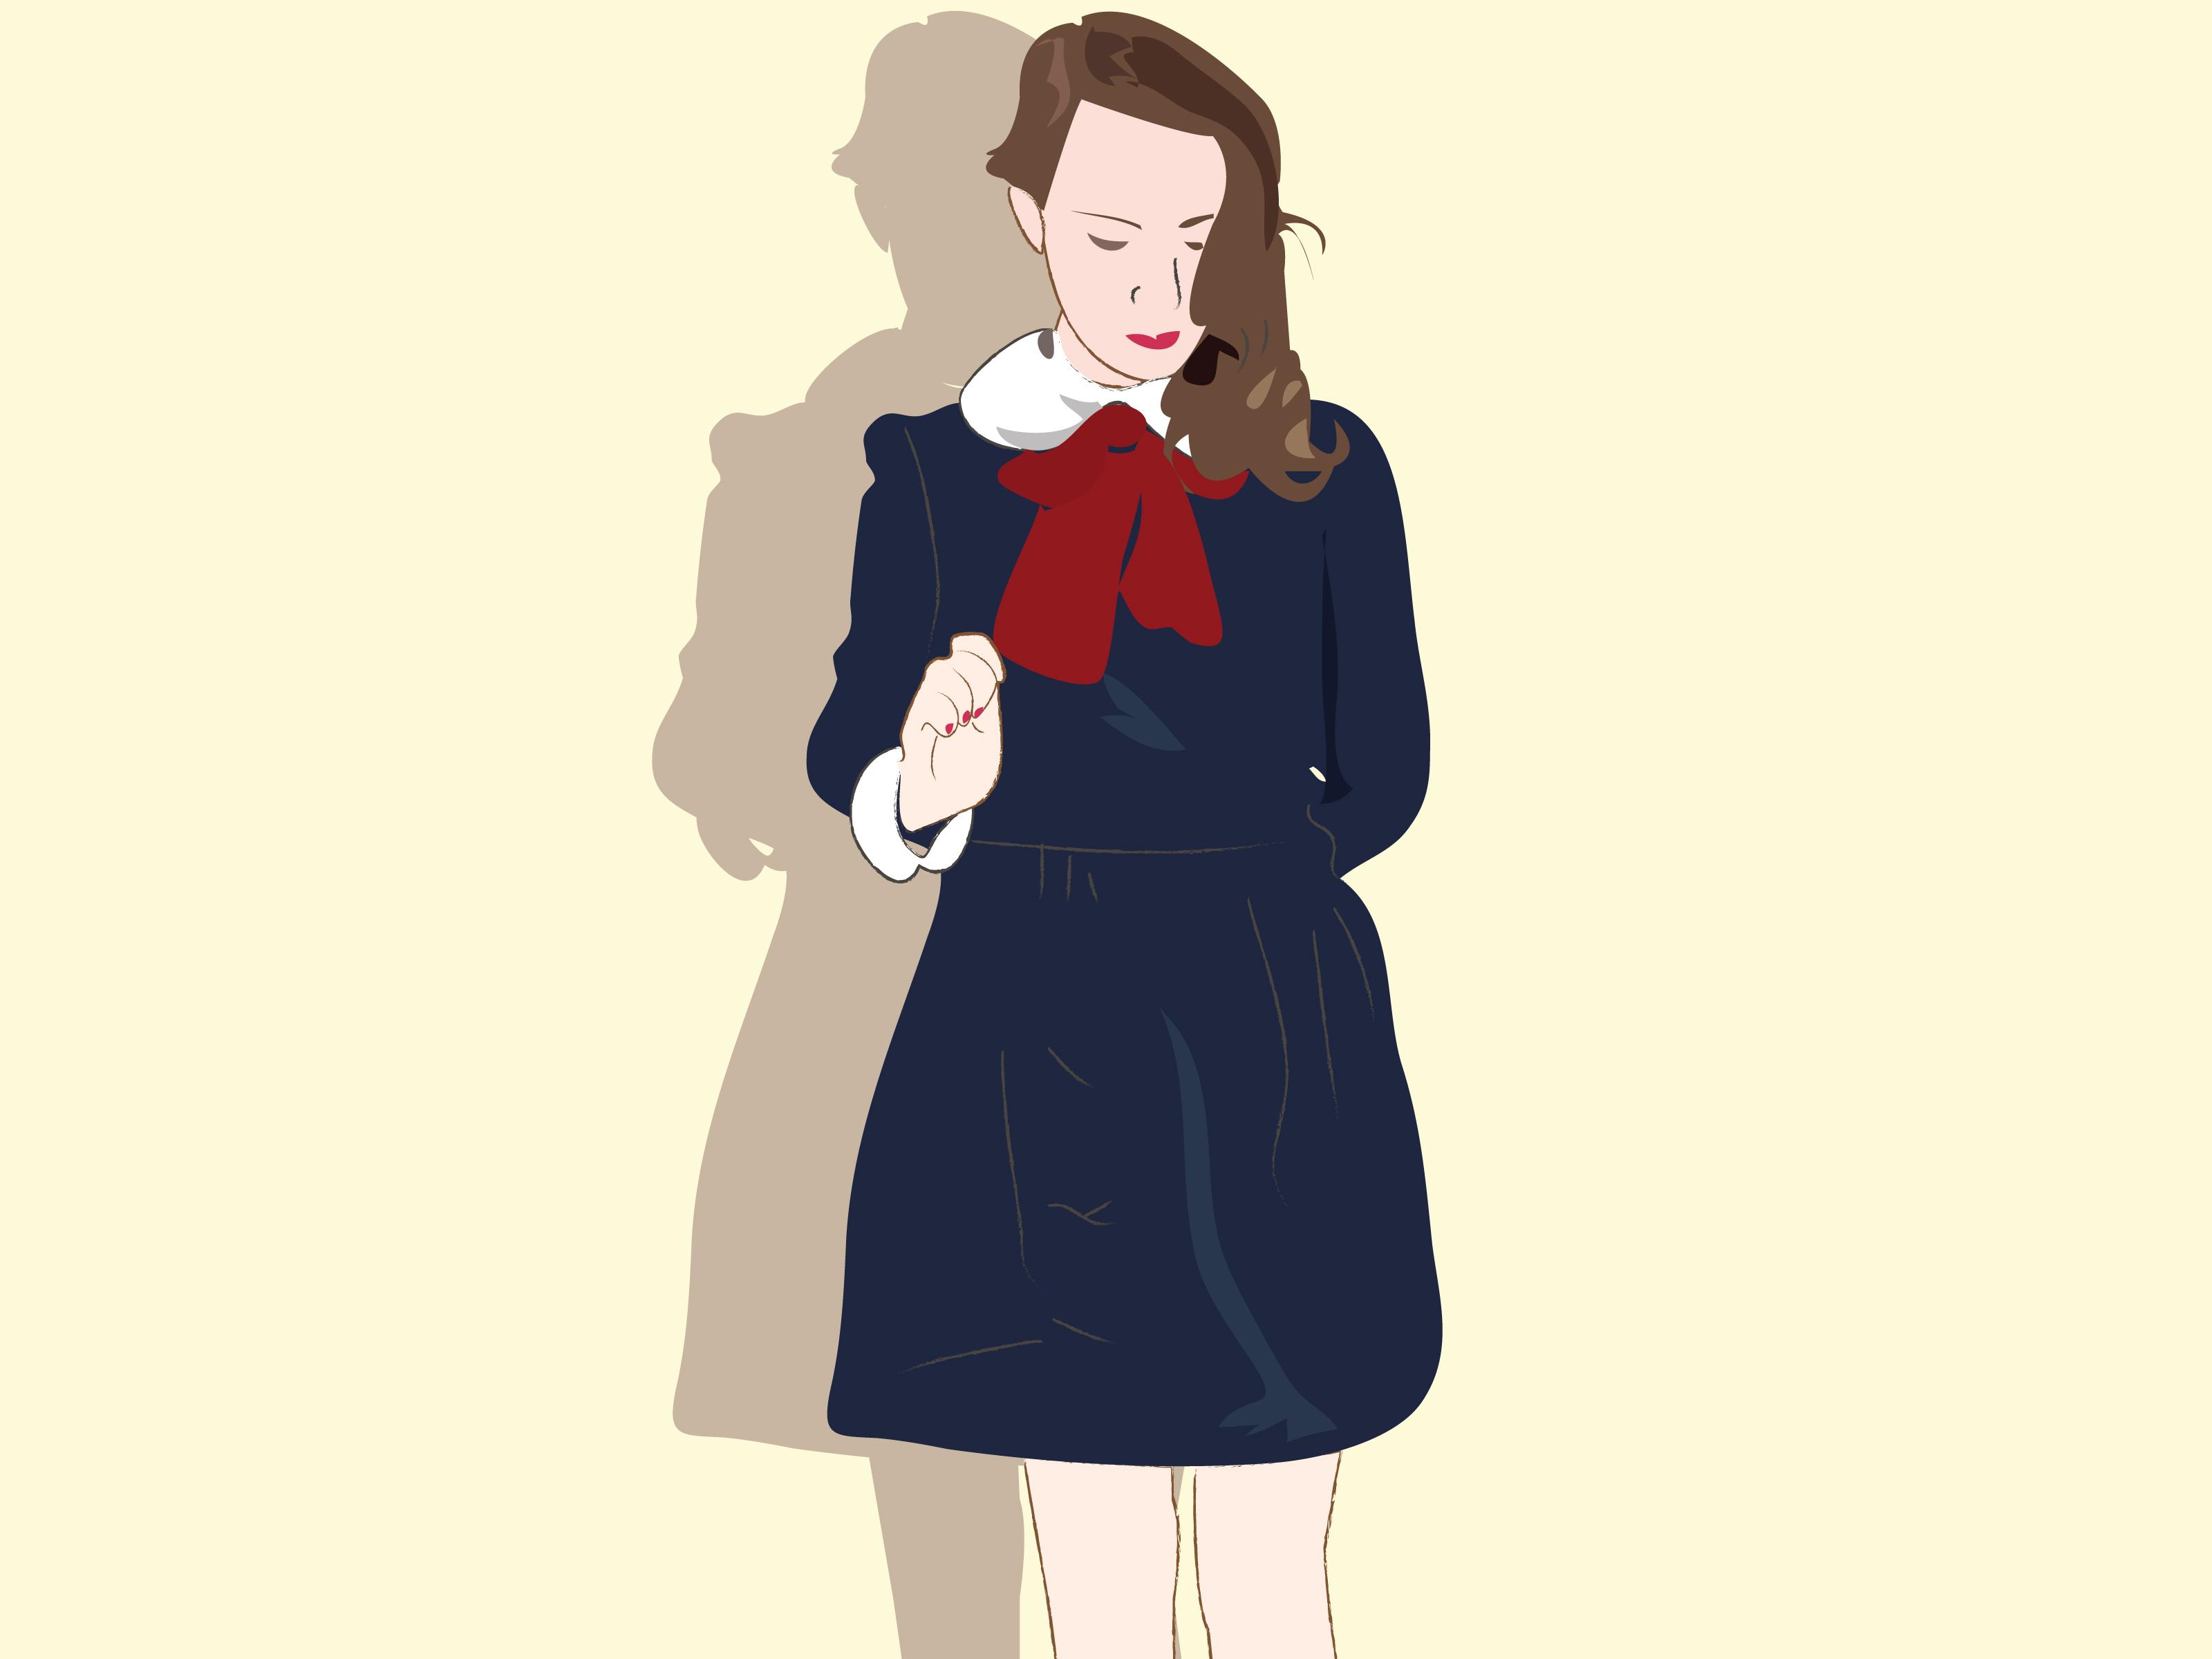 Hairy Design A Vintage Style Rockabilly School Uniform Step 16 Design A Dress Shirt Design A Dress Template wedding dress Design A Dress